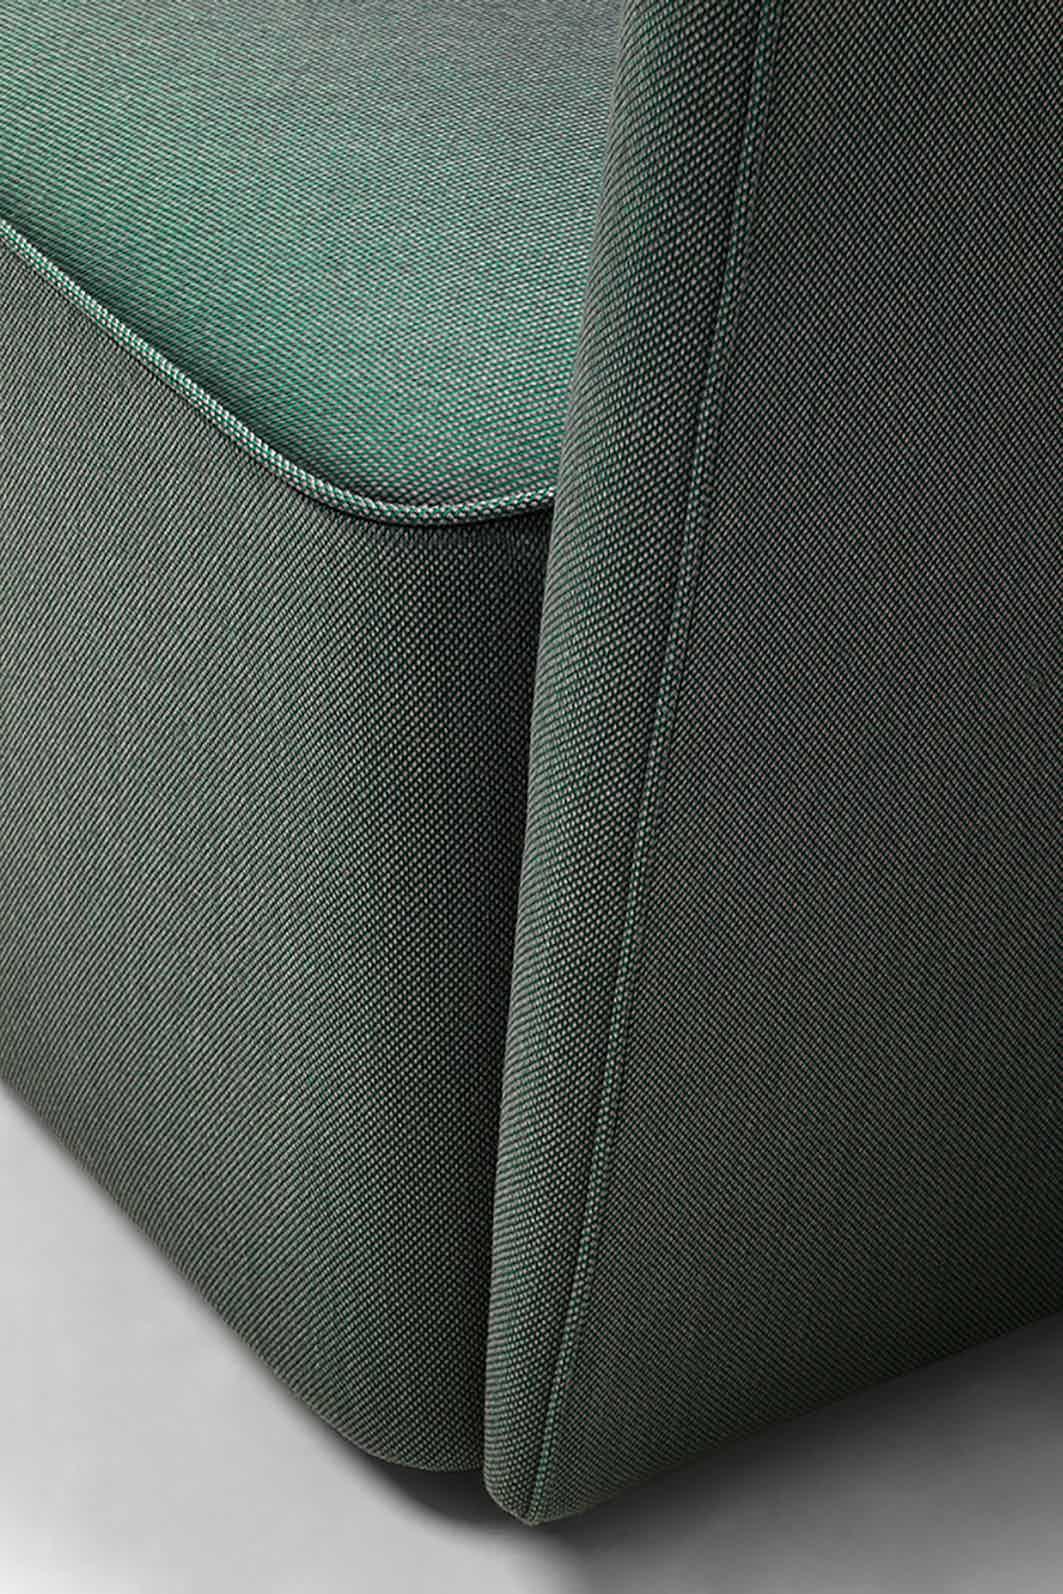 Lacividina-velour-modular-green-detail-haute-living